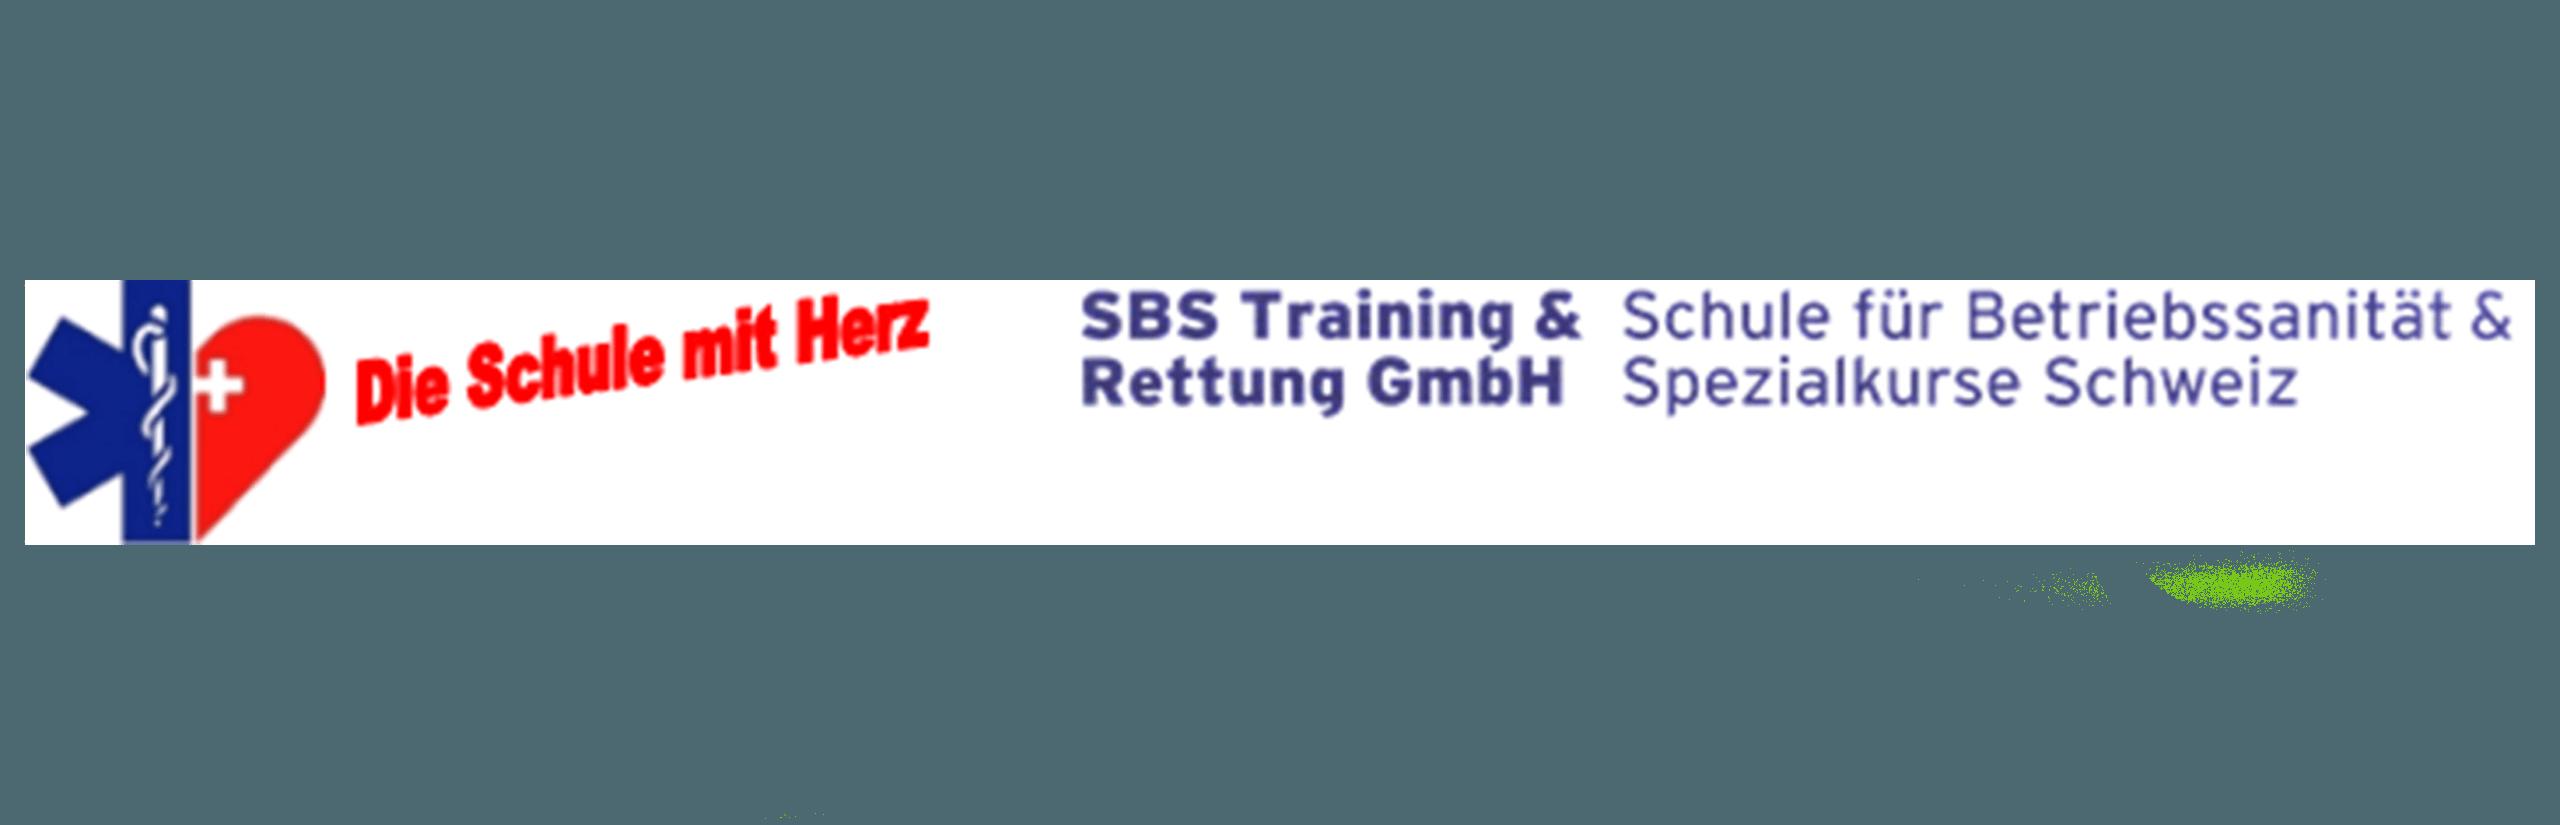 SBS Training & Rettung GmbH